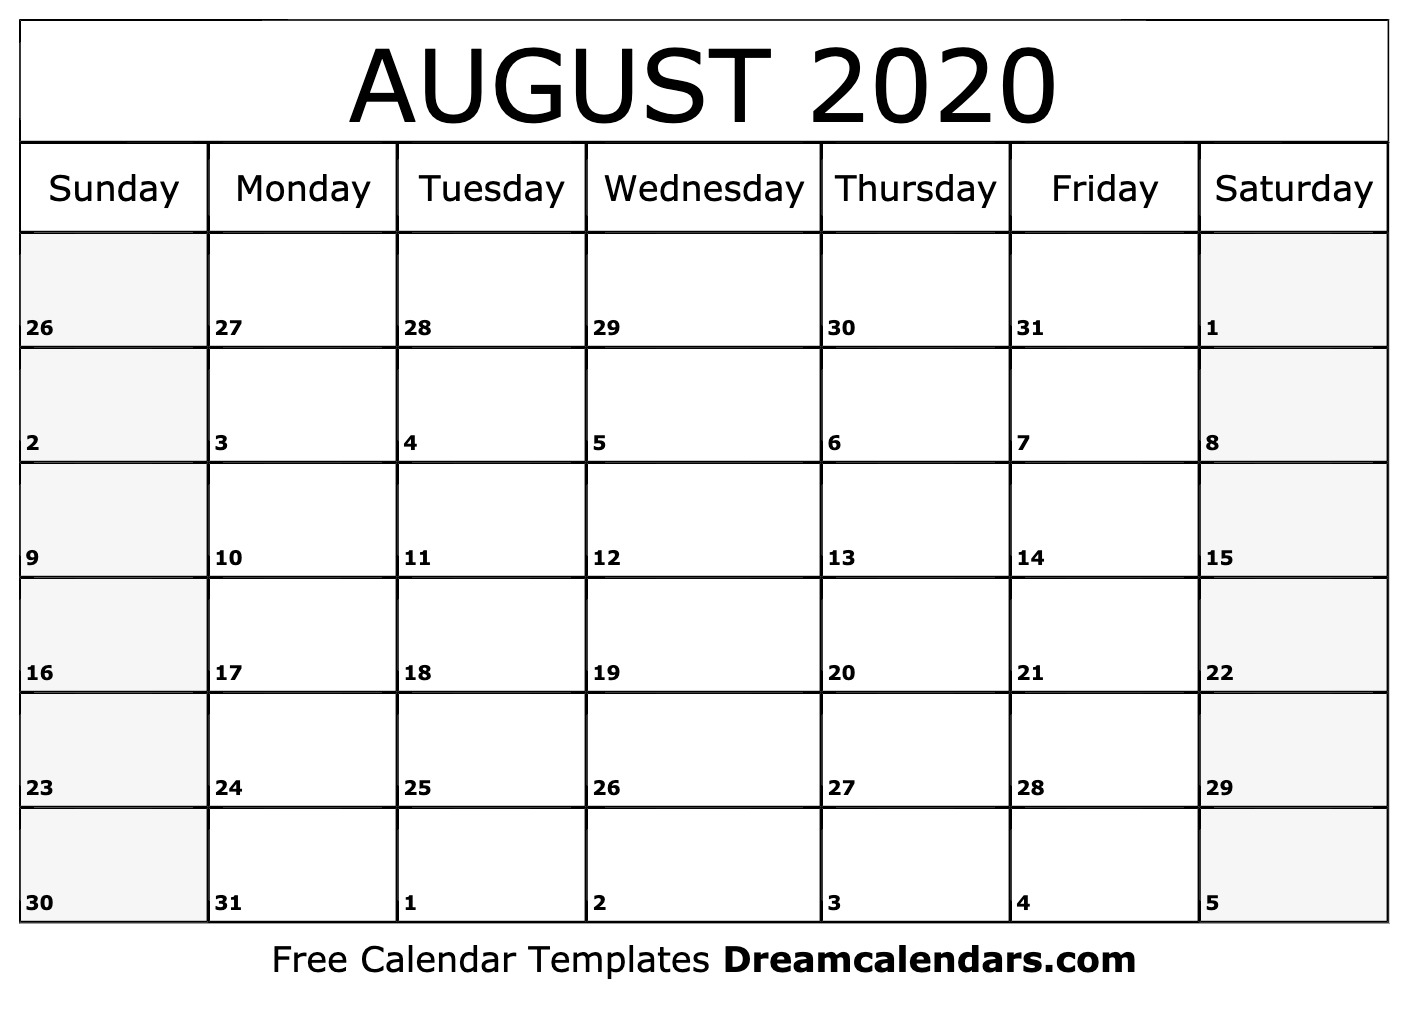 August 2020 Calendar Printable Printable August 2020 Calendar